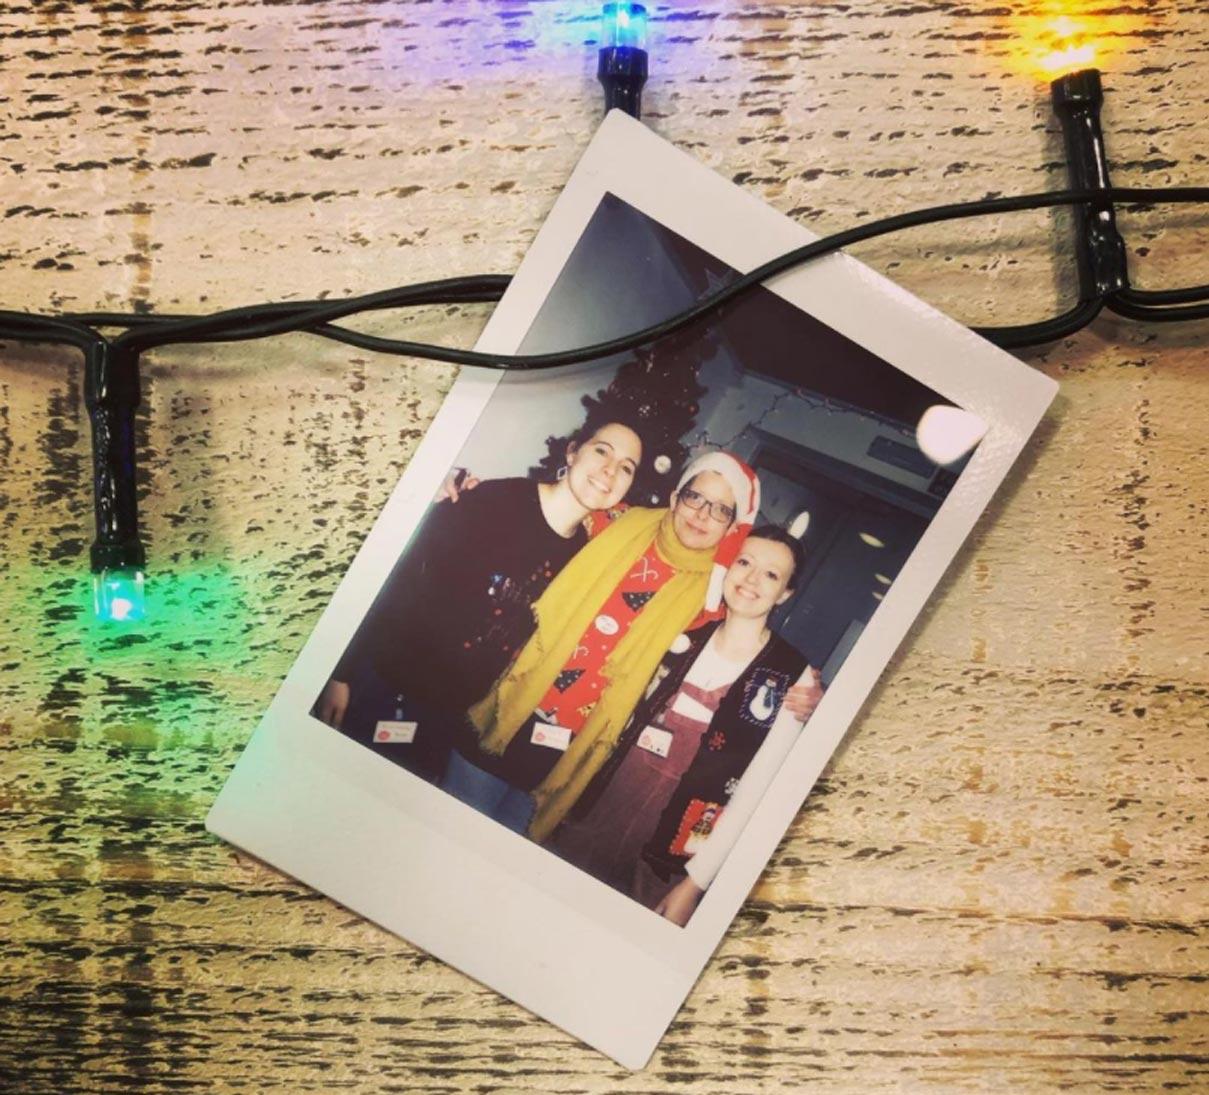 Polaroid Moments and Hope at Christmas